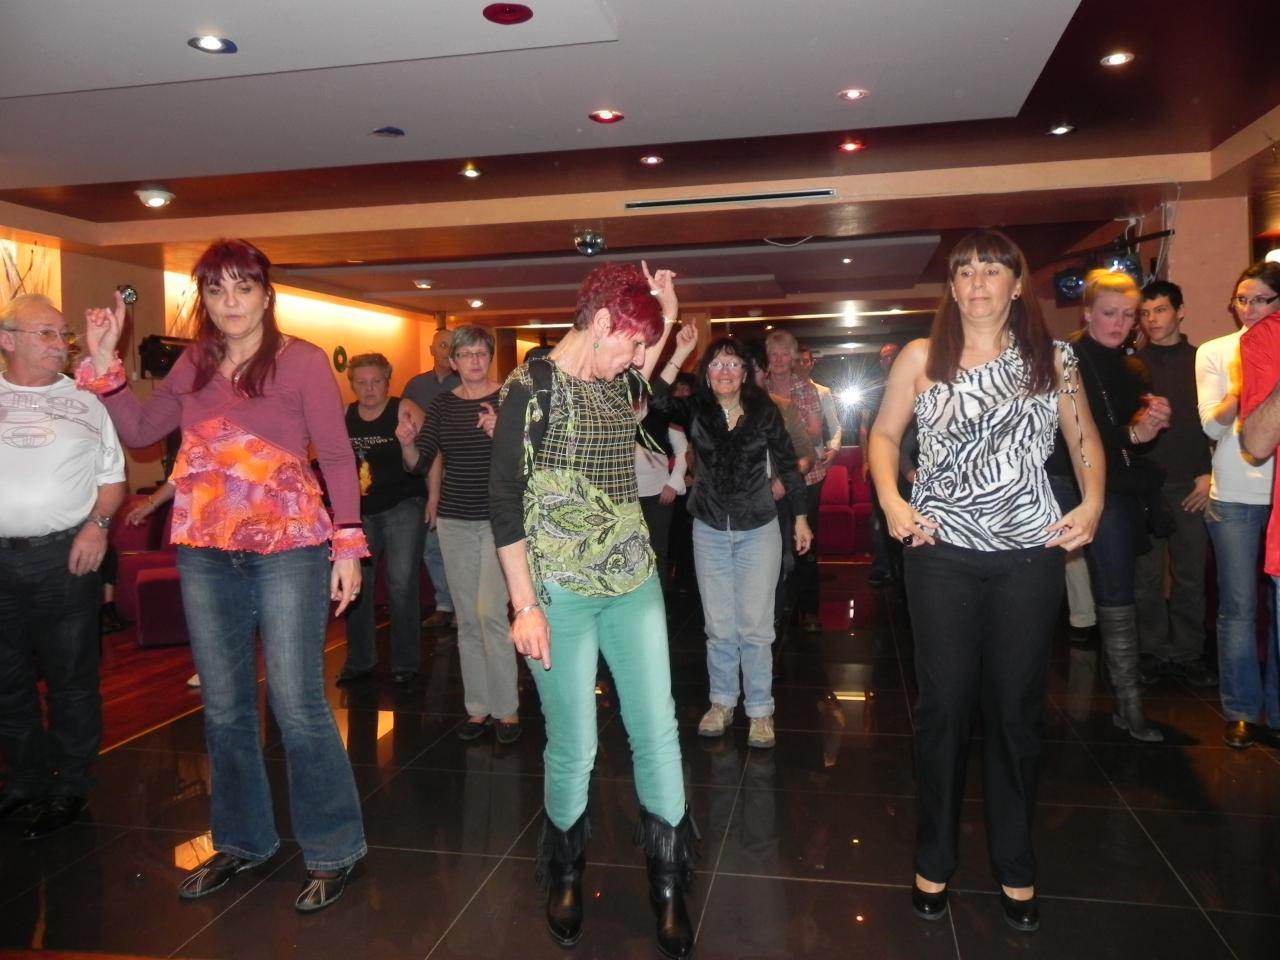 sortie font romeu country 17-18 mars 2012 148